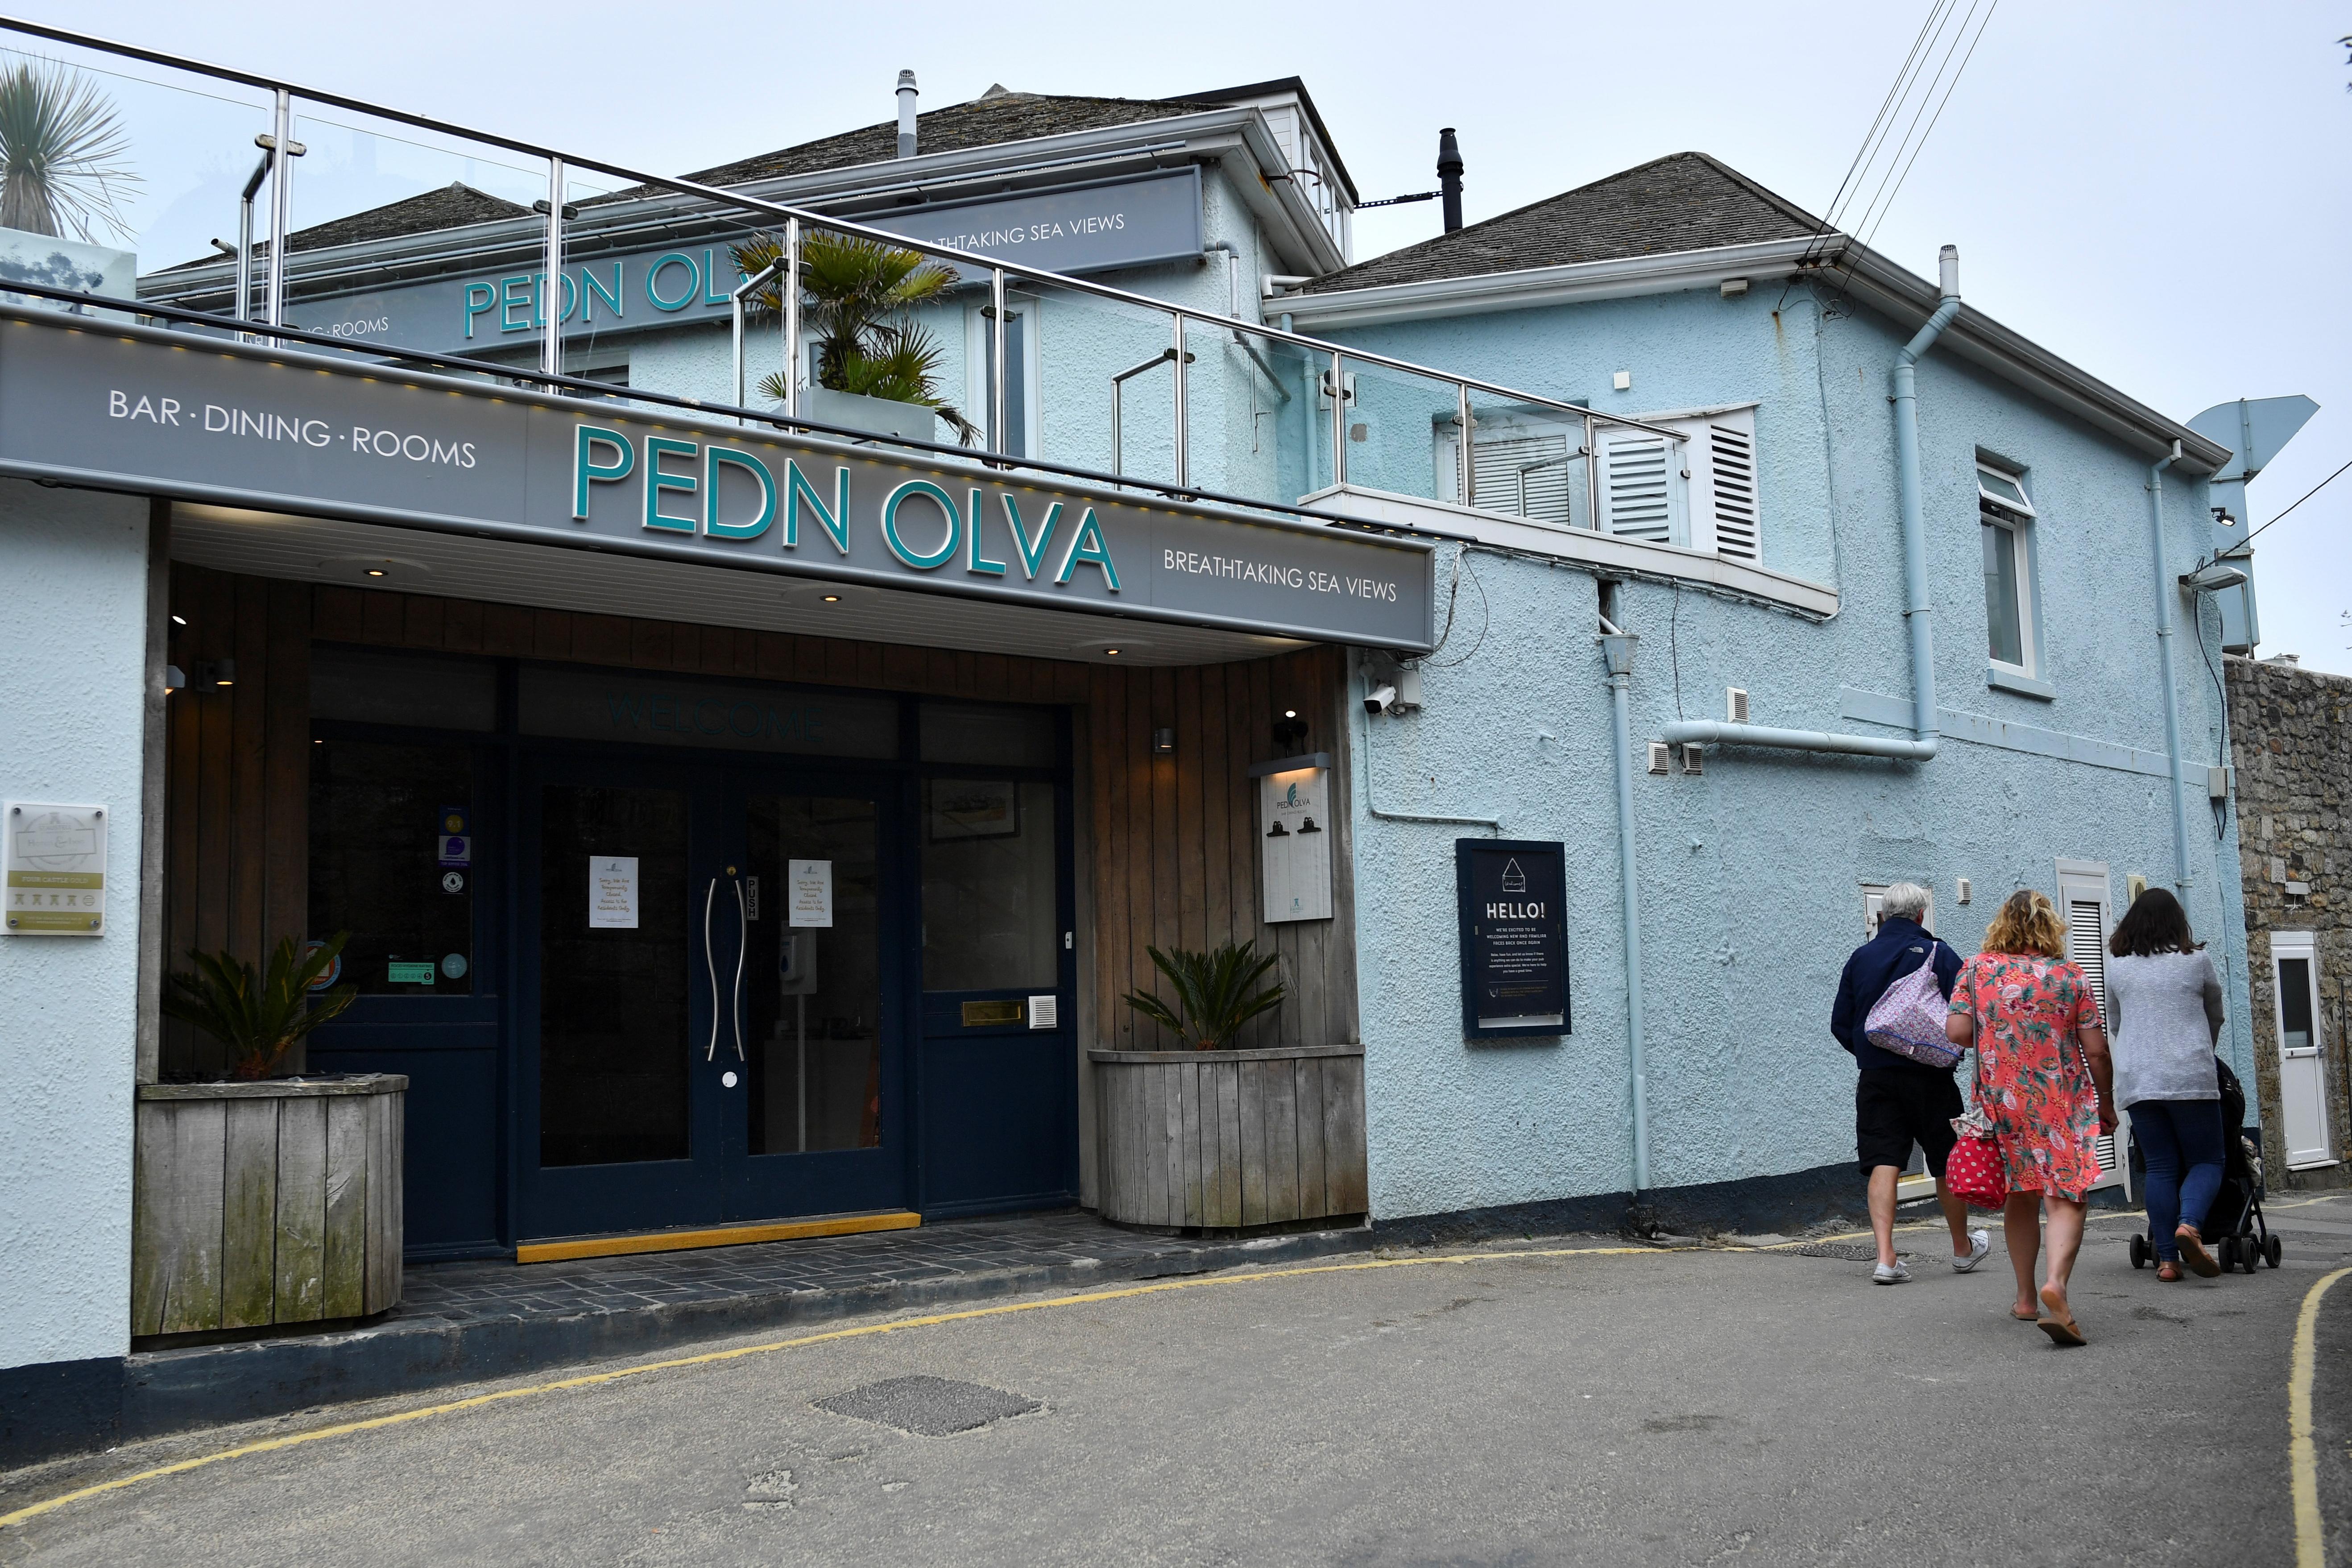 COVID-19 outbreak closes hotel hosting G7 summit delegation